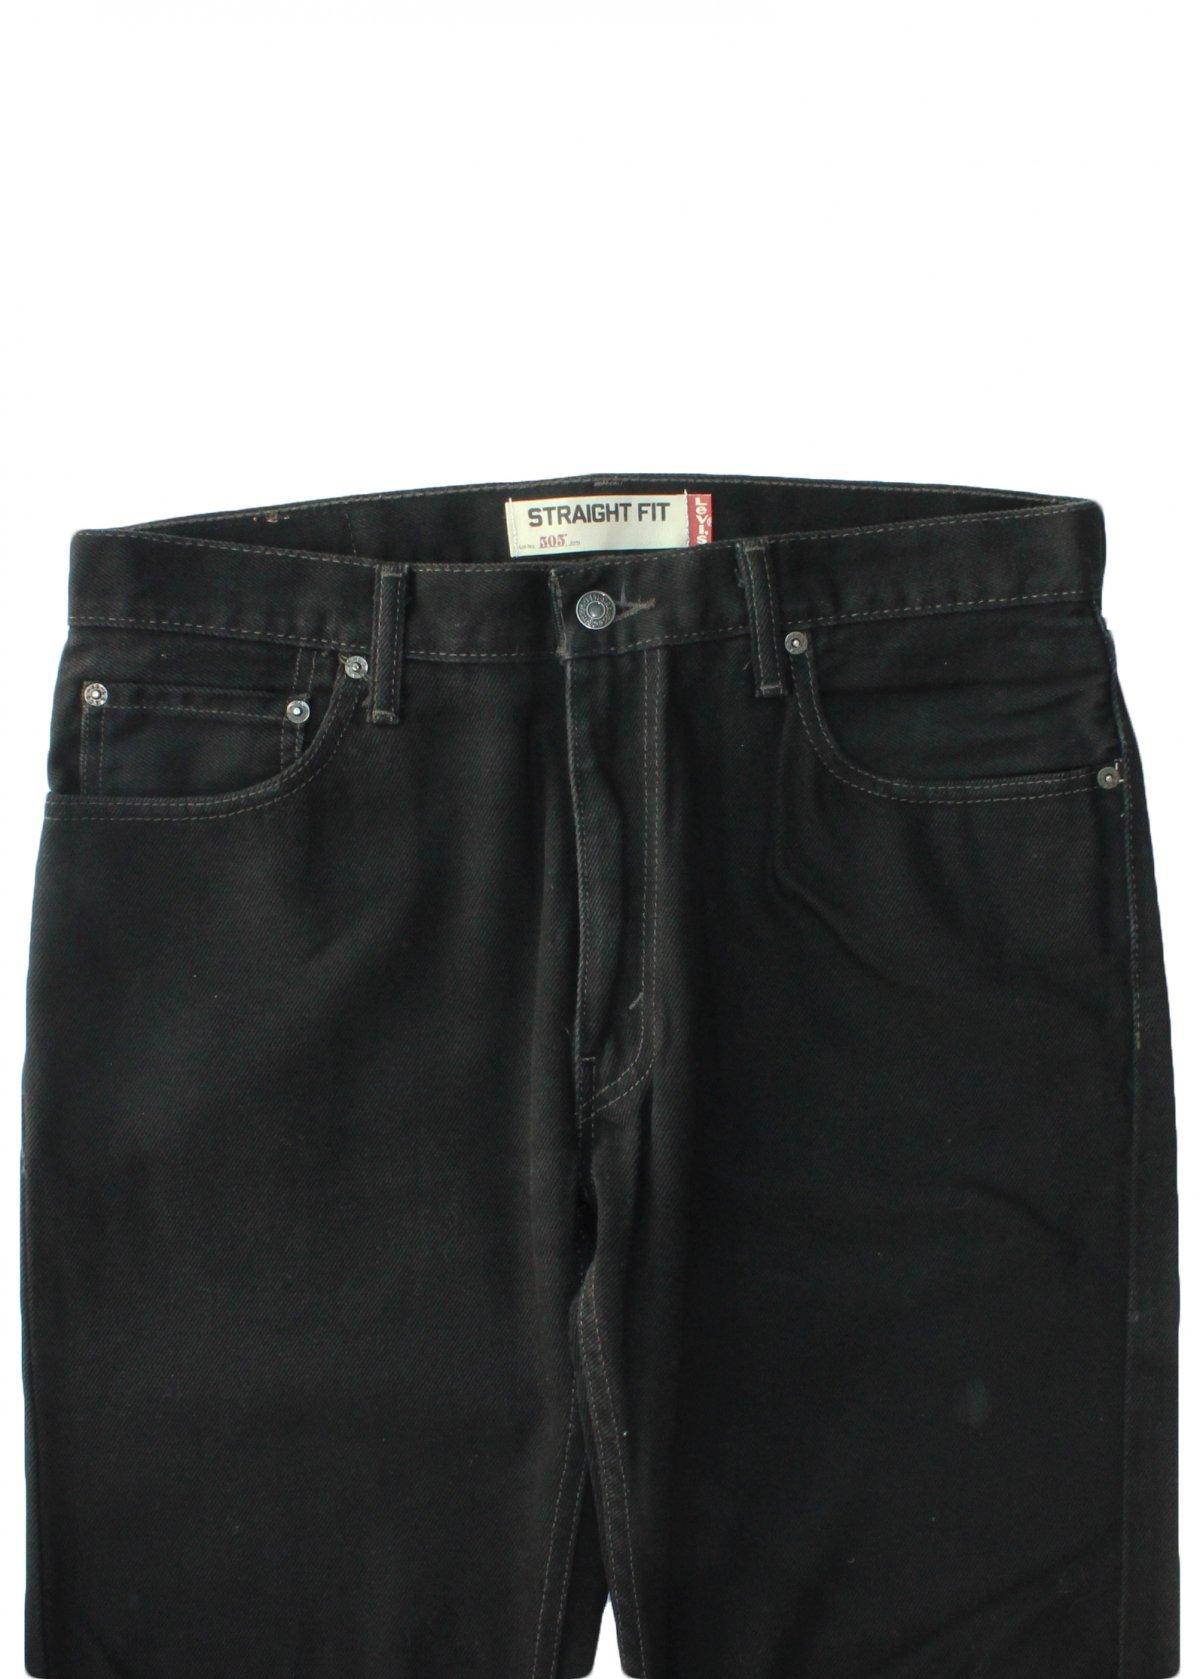 I&I 古着 通販 Levi's 505  Denim Pants 詳細画像7